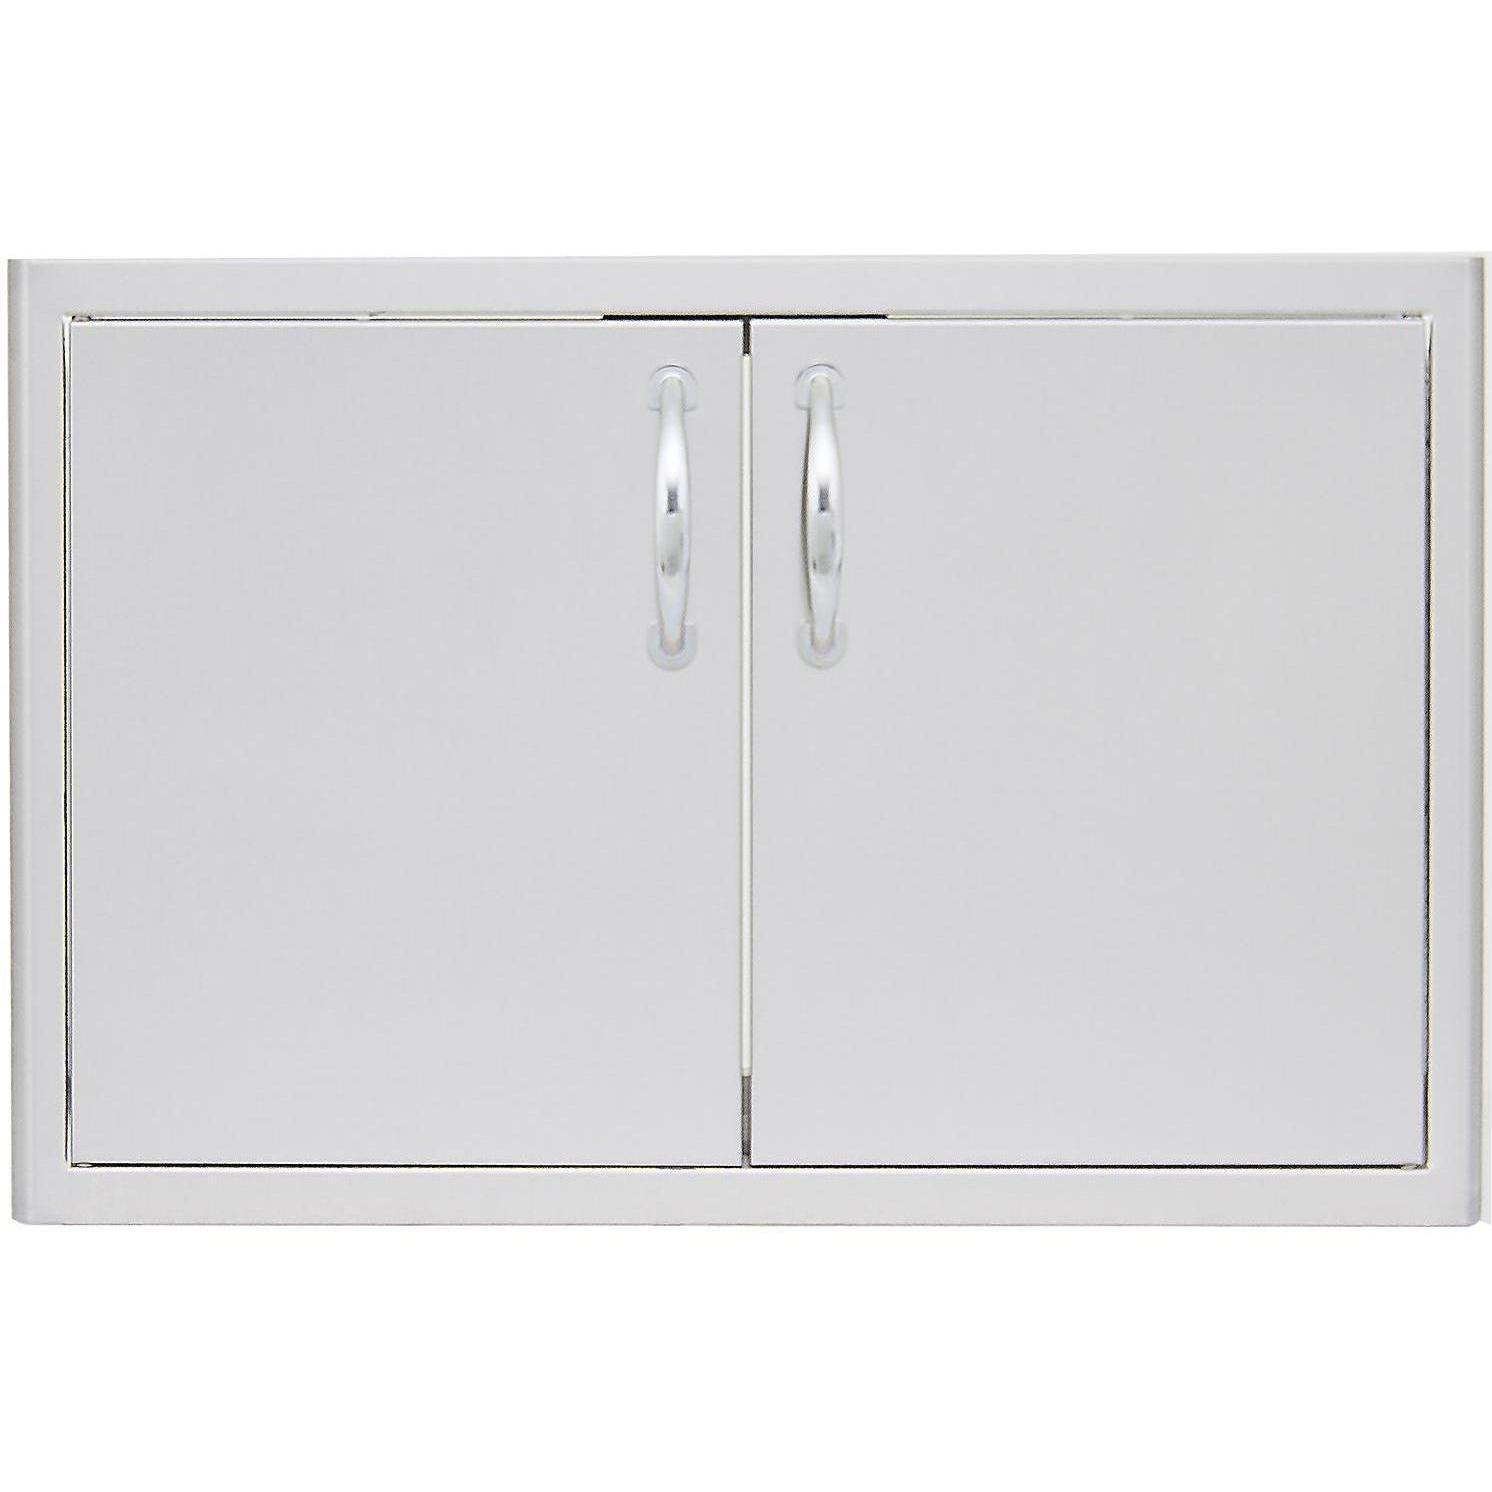 Blaze Stainless Steel Dry Storage Doors (BLZ-DRY-STG), 32-inch